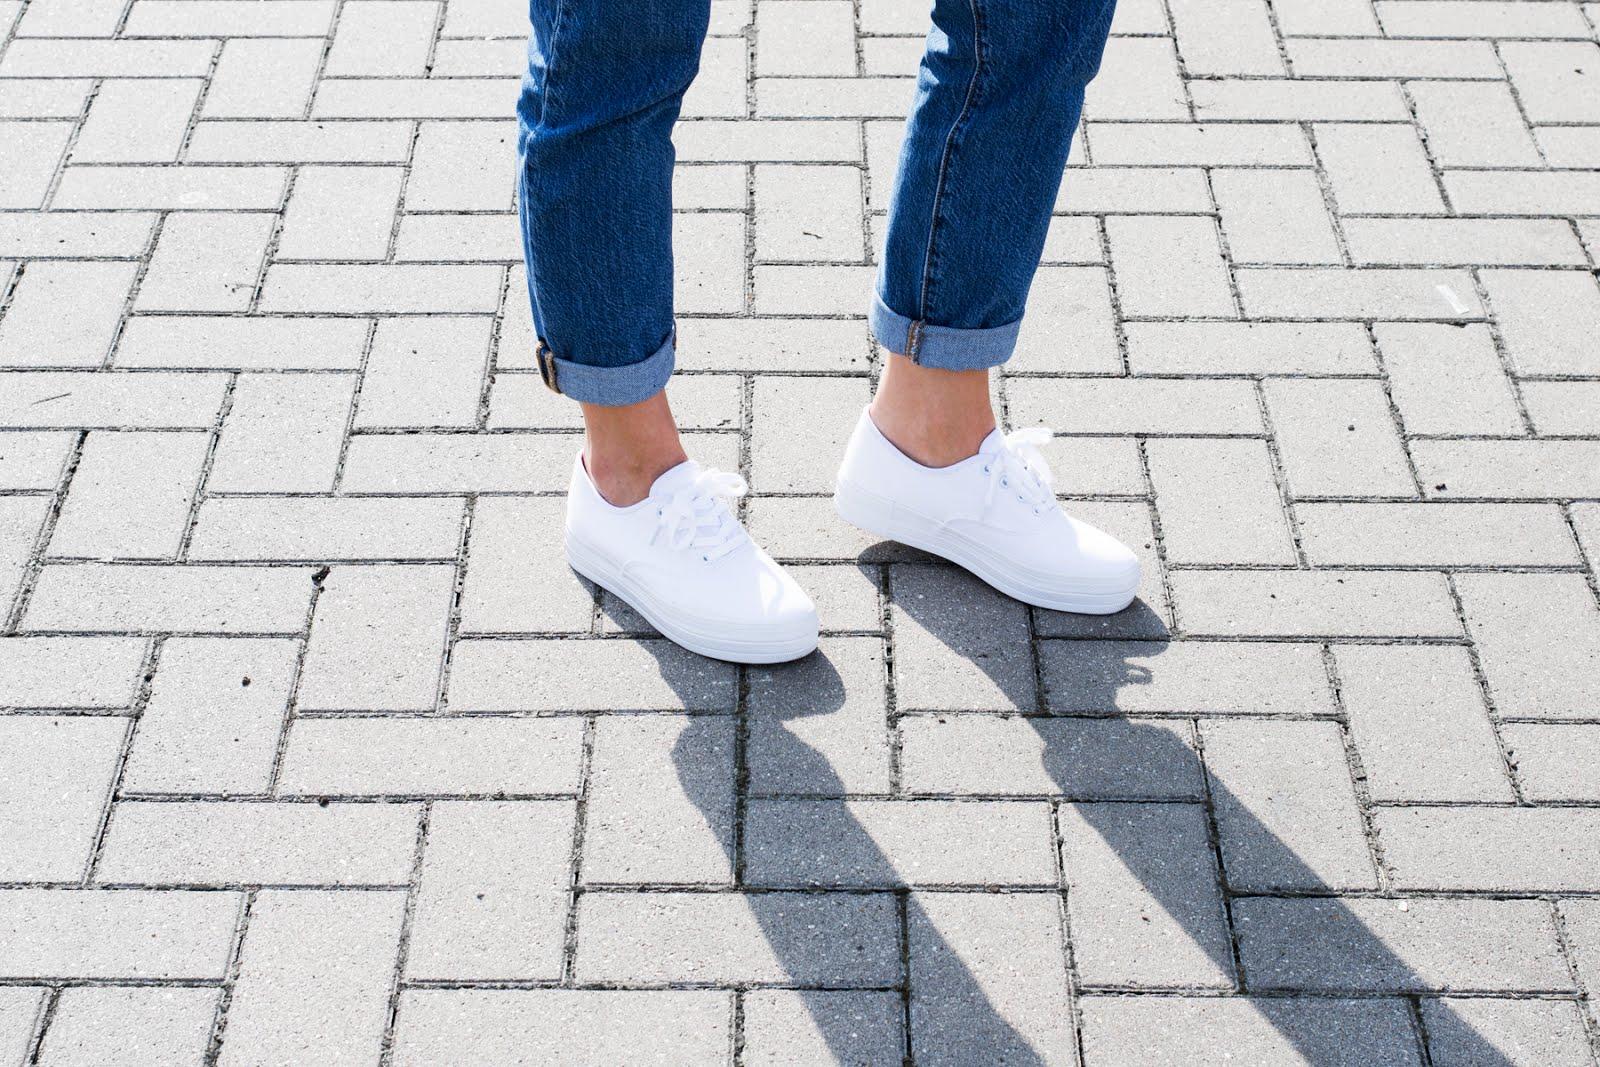 levi's 501 jeans, surf shack, sacha white flatform sneakers, platform